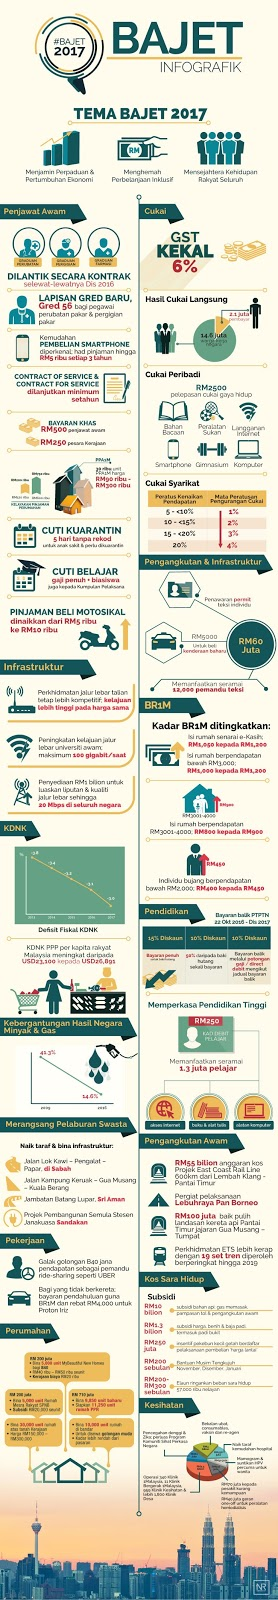 infografik bajet 2017, infographic Budget 2017, Budget 2017, Bajet 2017 Malaysia, Apa kelebihan bajet 2017, keistimewaan kakitangan kerajaan dalam bajet 2017,